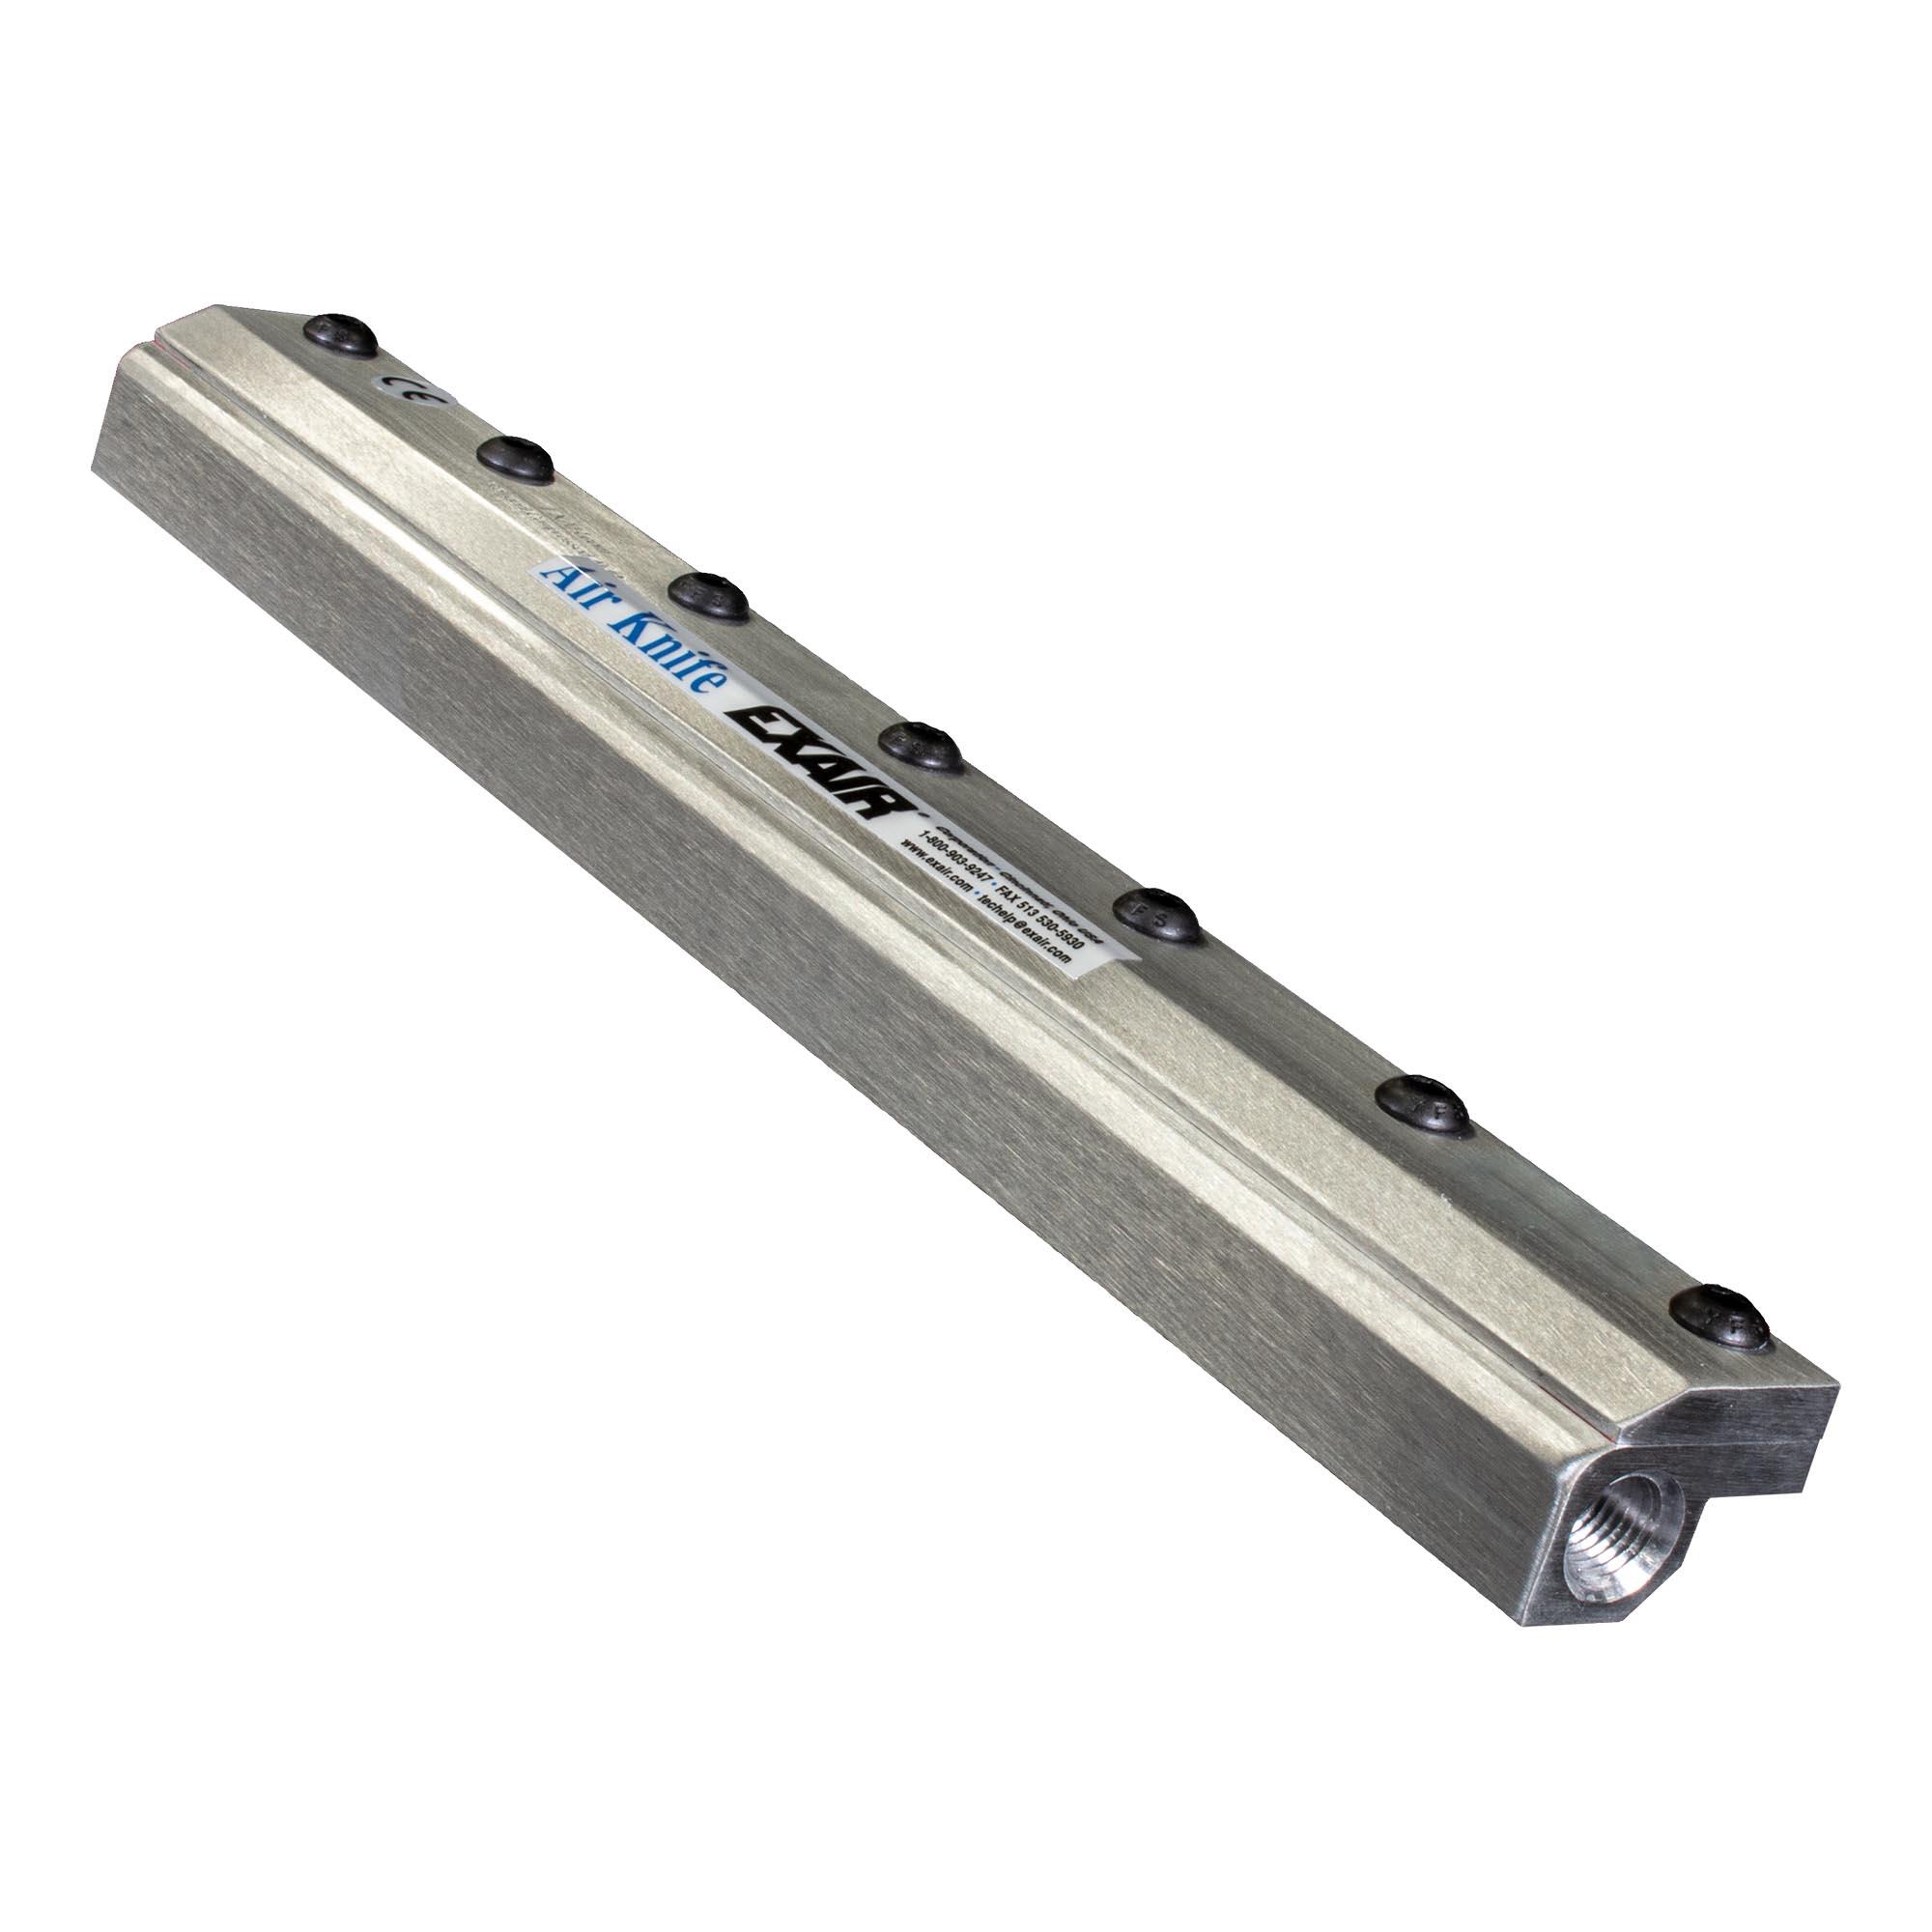 Aluminum Standard Air Knife